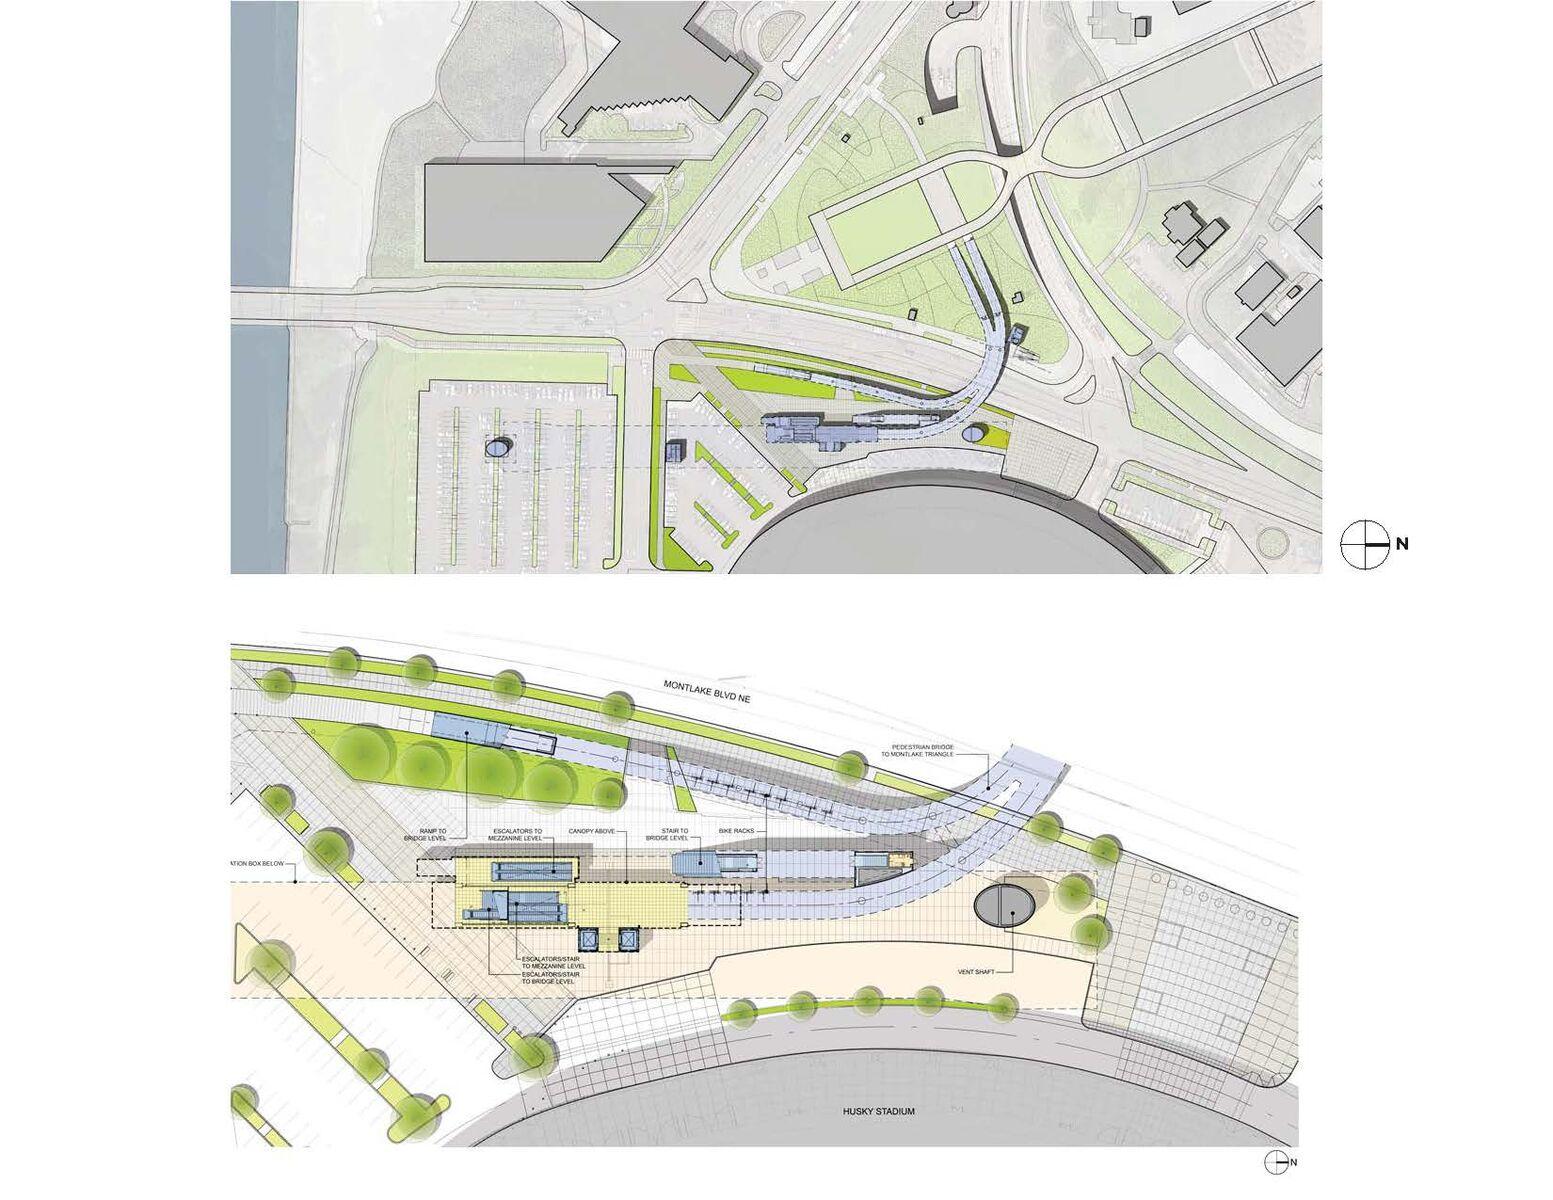 University of Washington Transit Station by